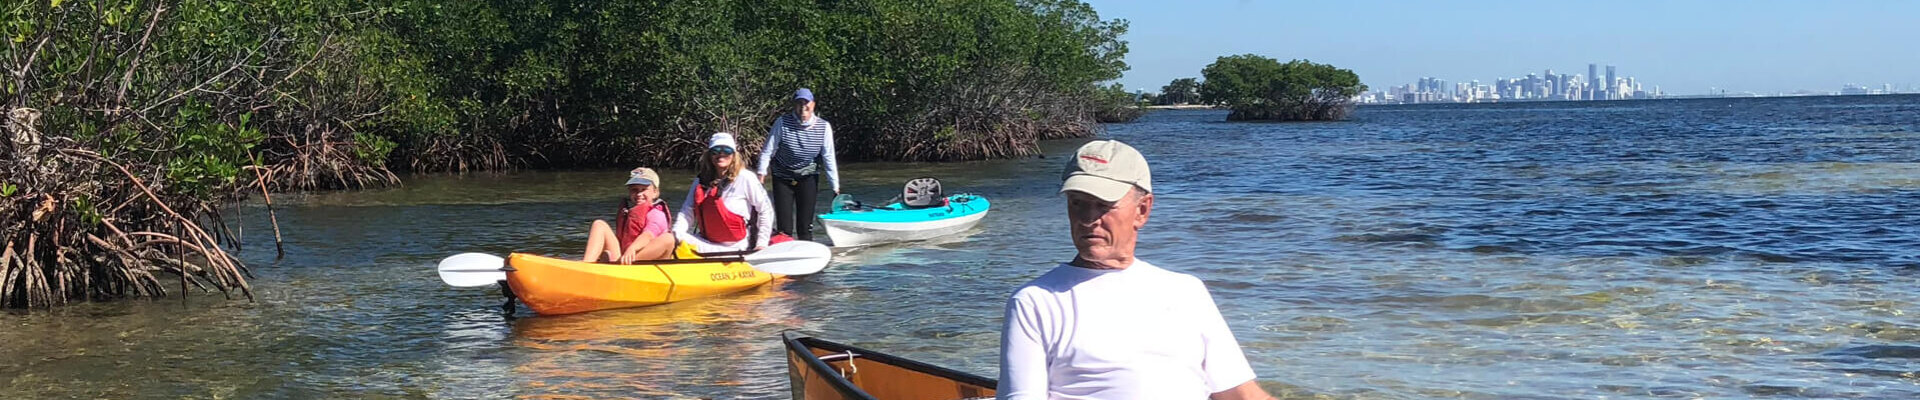 Chapman Field Park Kayak & Paddleboard Rentals